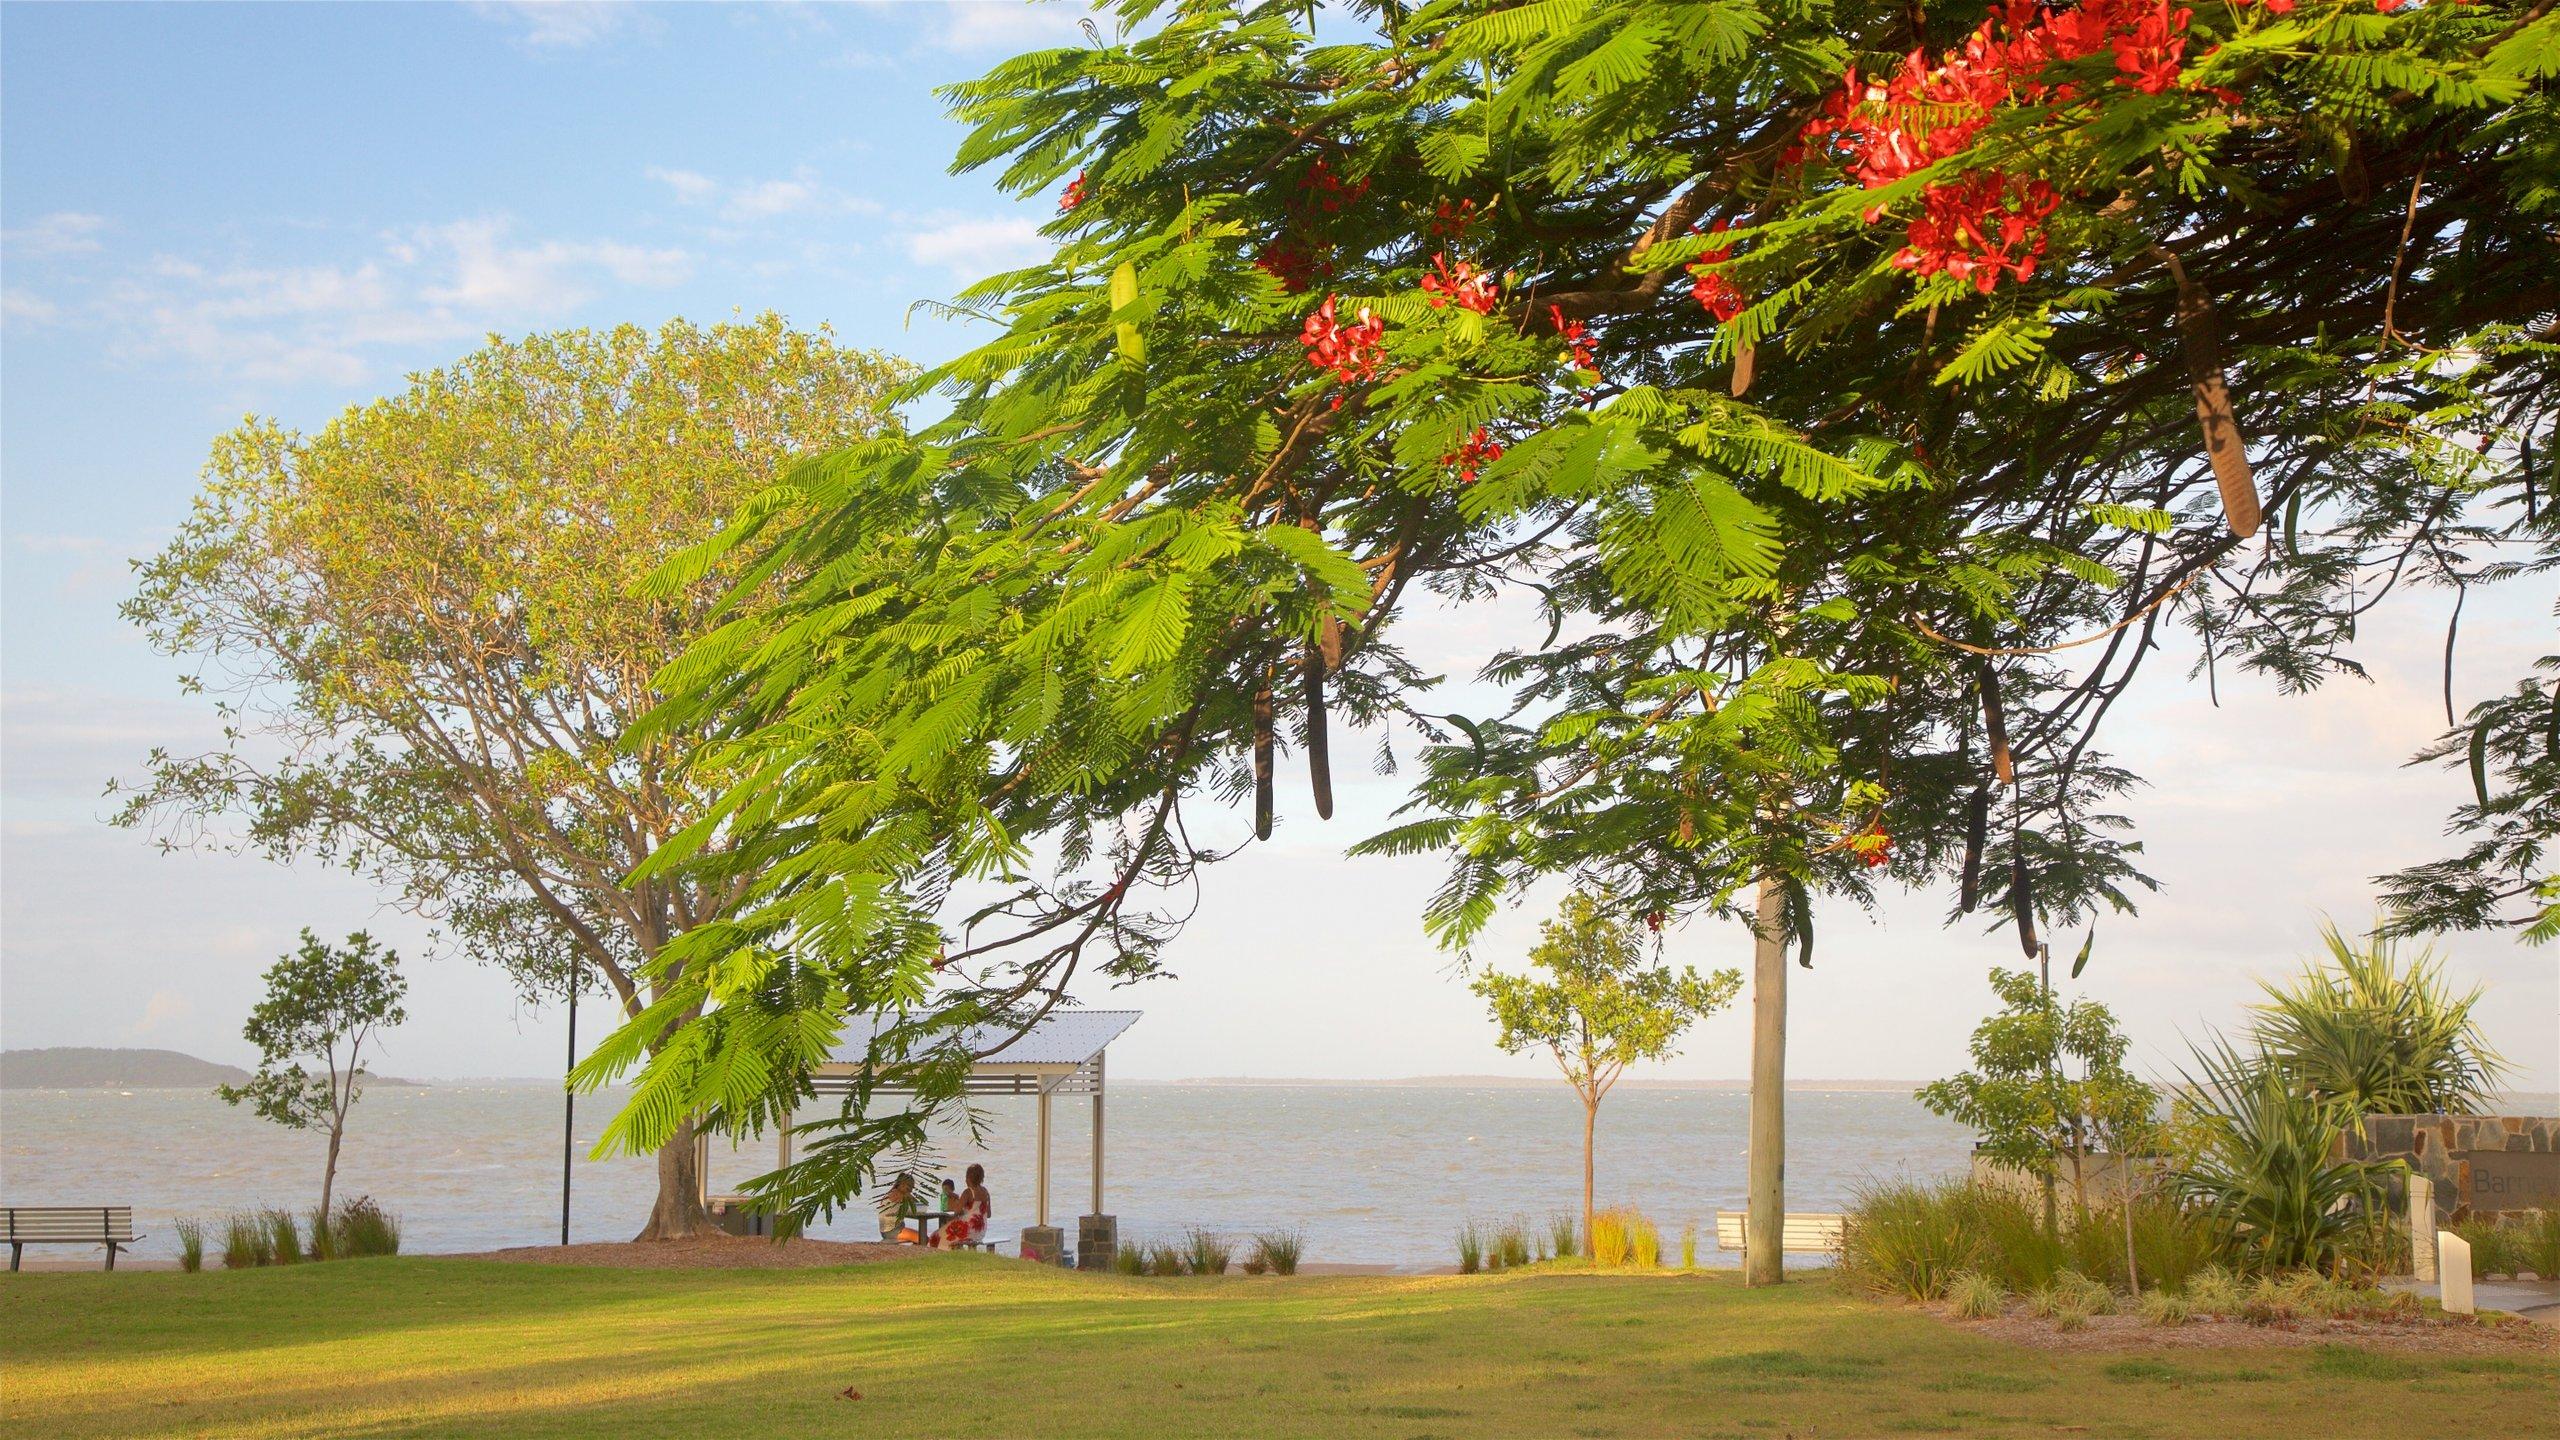 Barney Point, Gladstone, Queensland, Australia